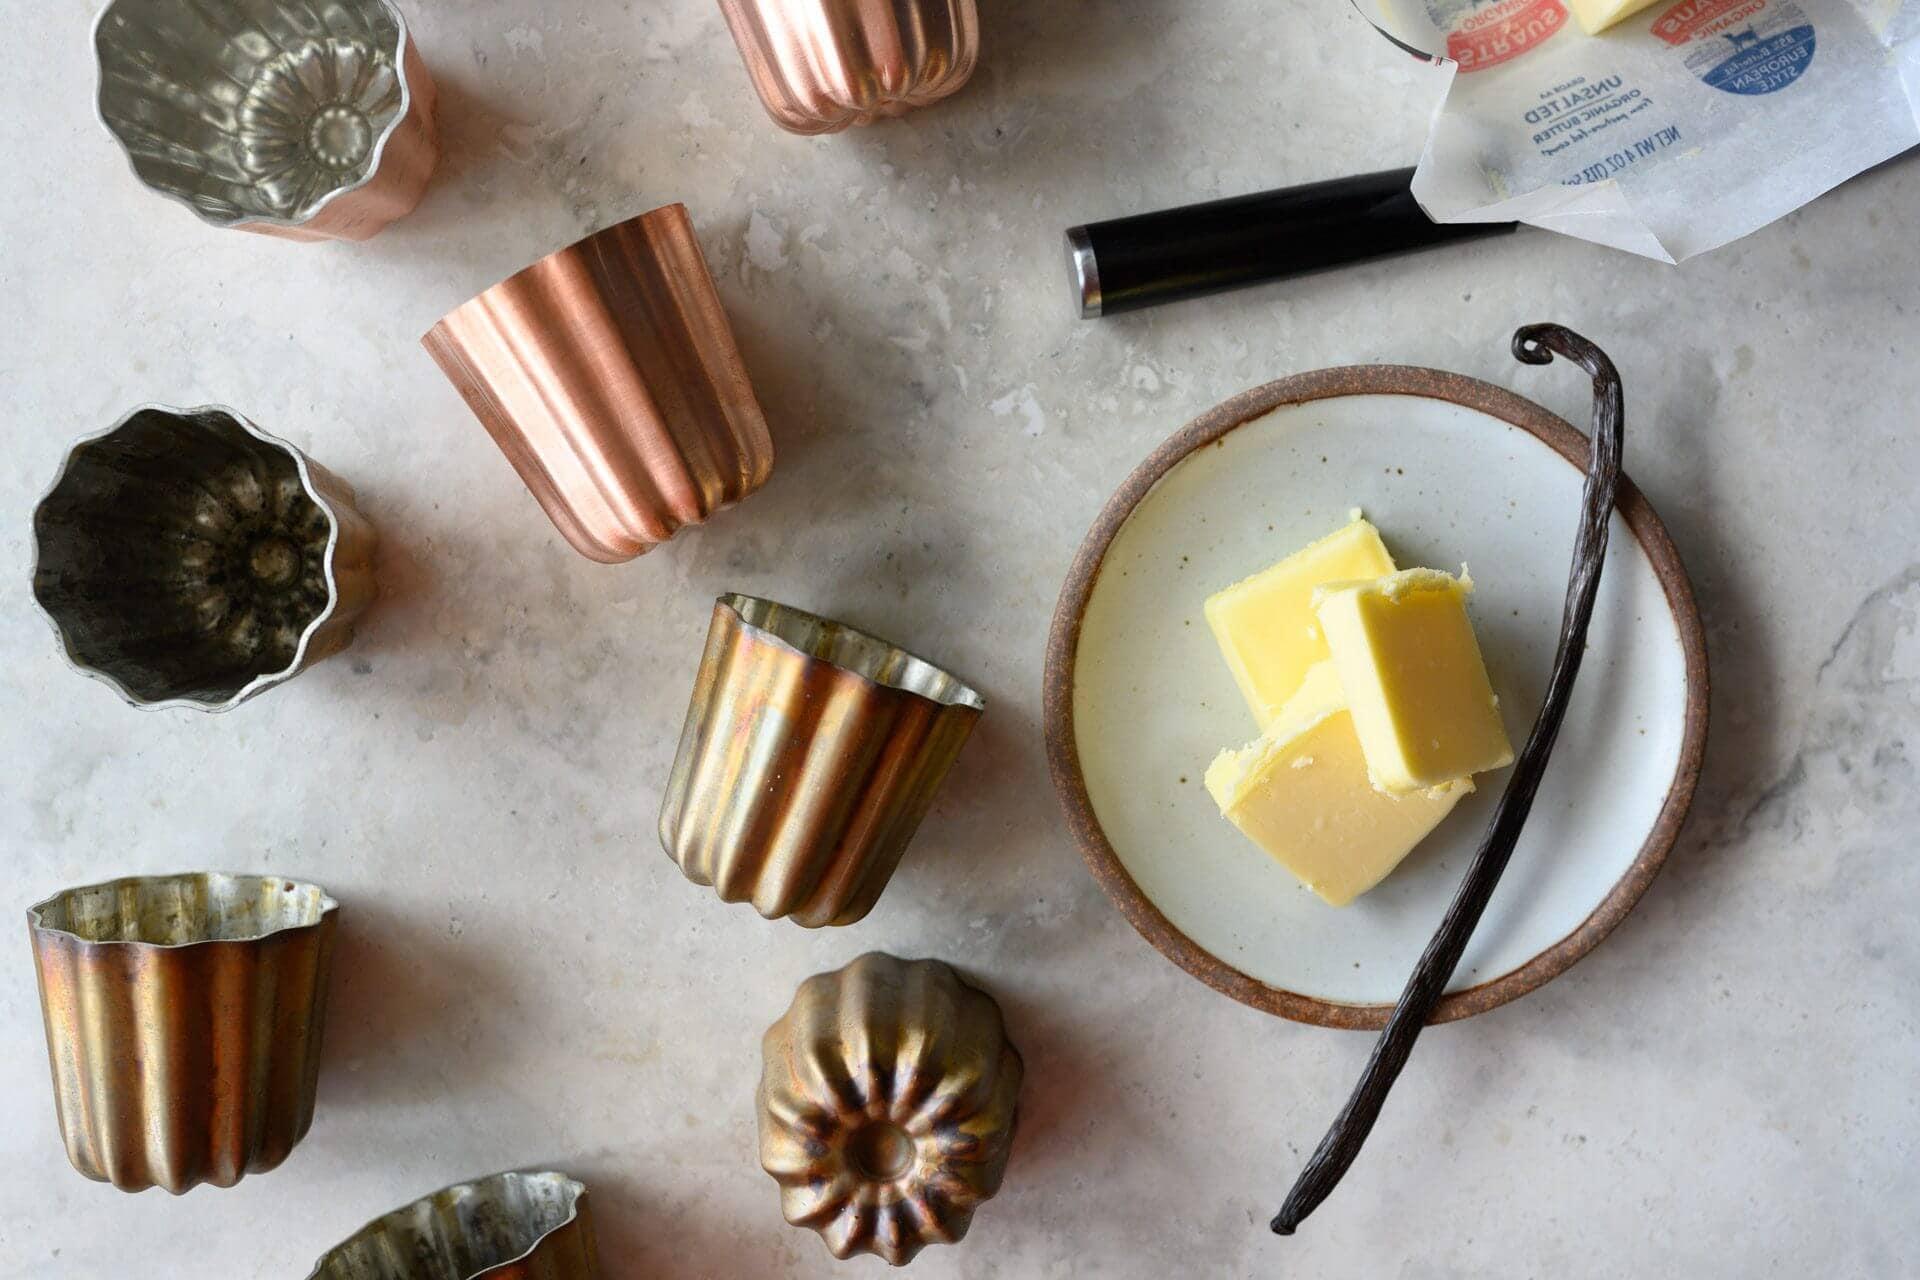 Tinned copper canelé molds